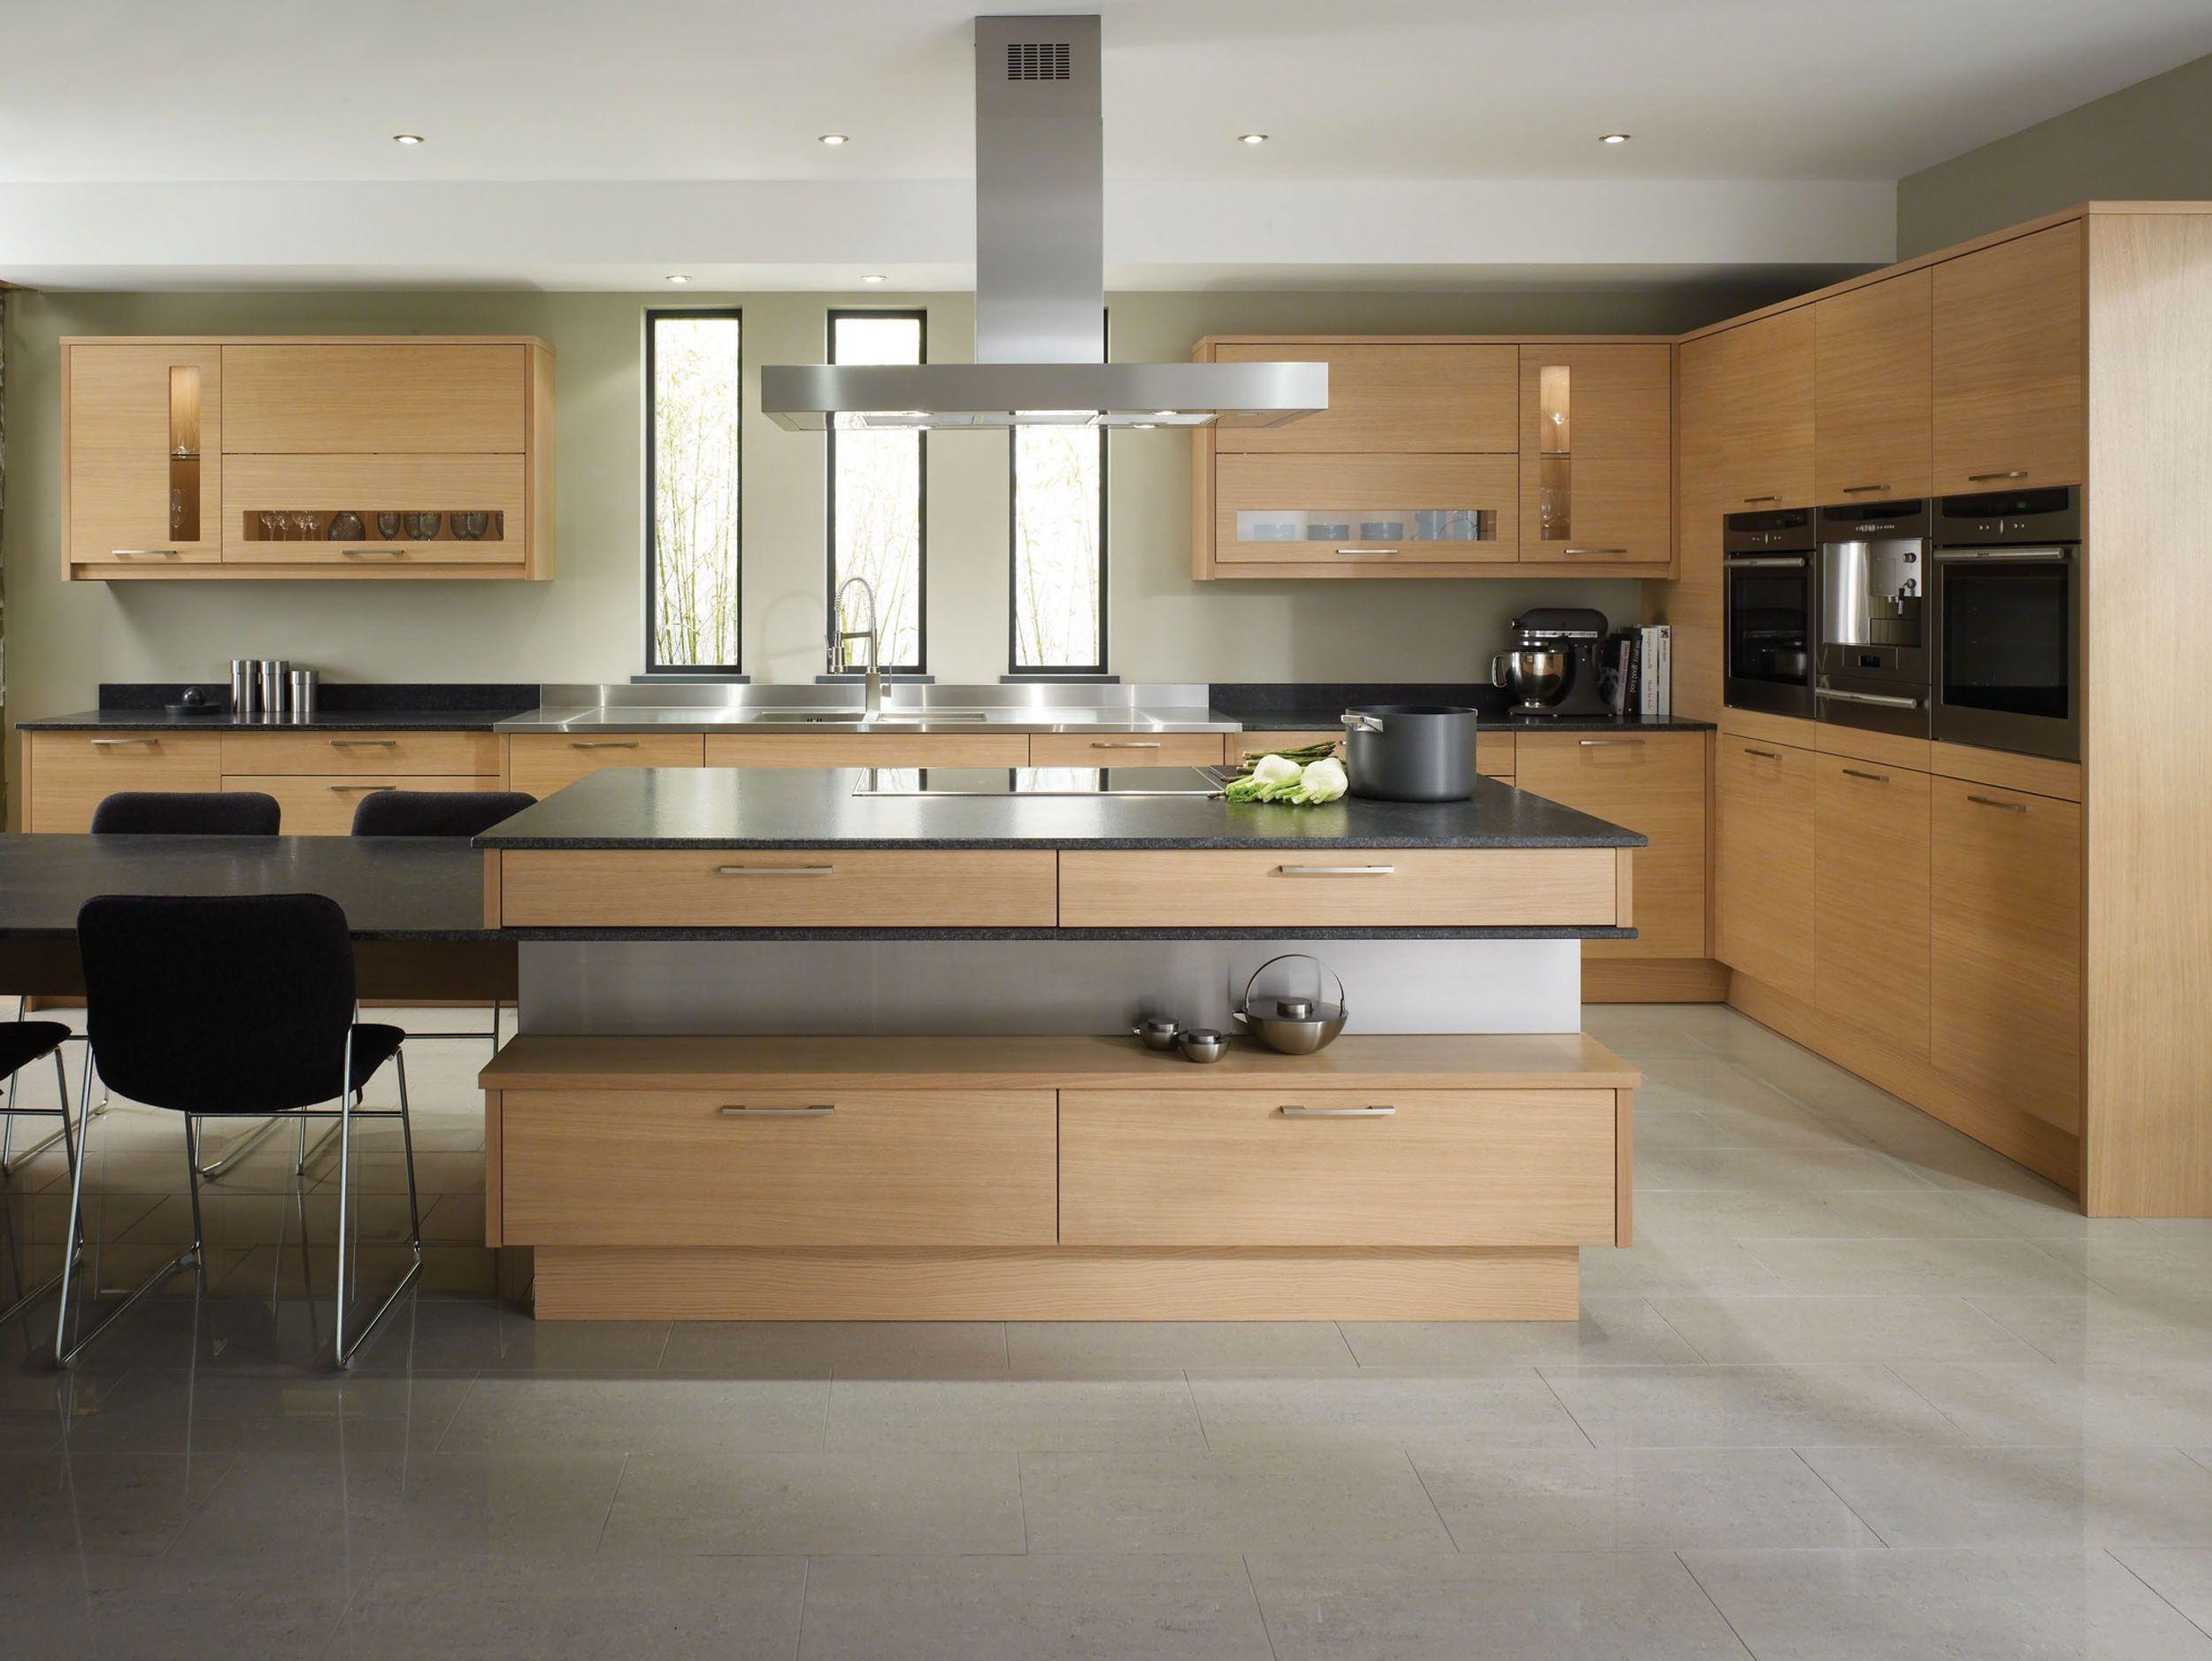 Kitchen Design Modern Contemporary  Httpsodakaustica Extraordinary Contemporary Kitchen Cabinets Decorating Design